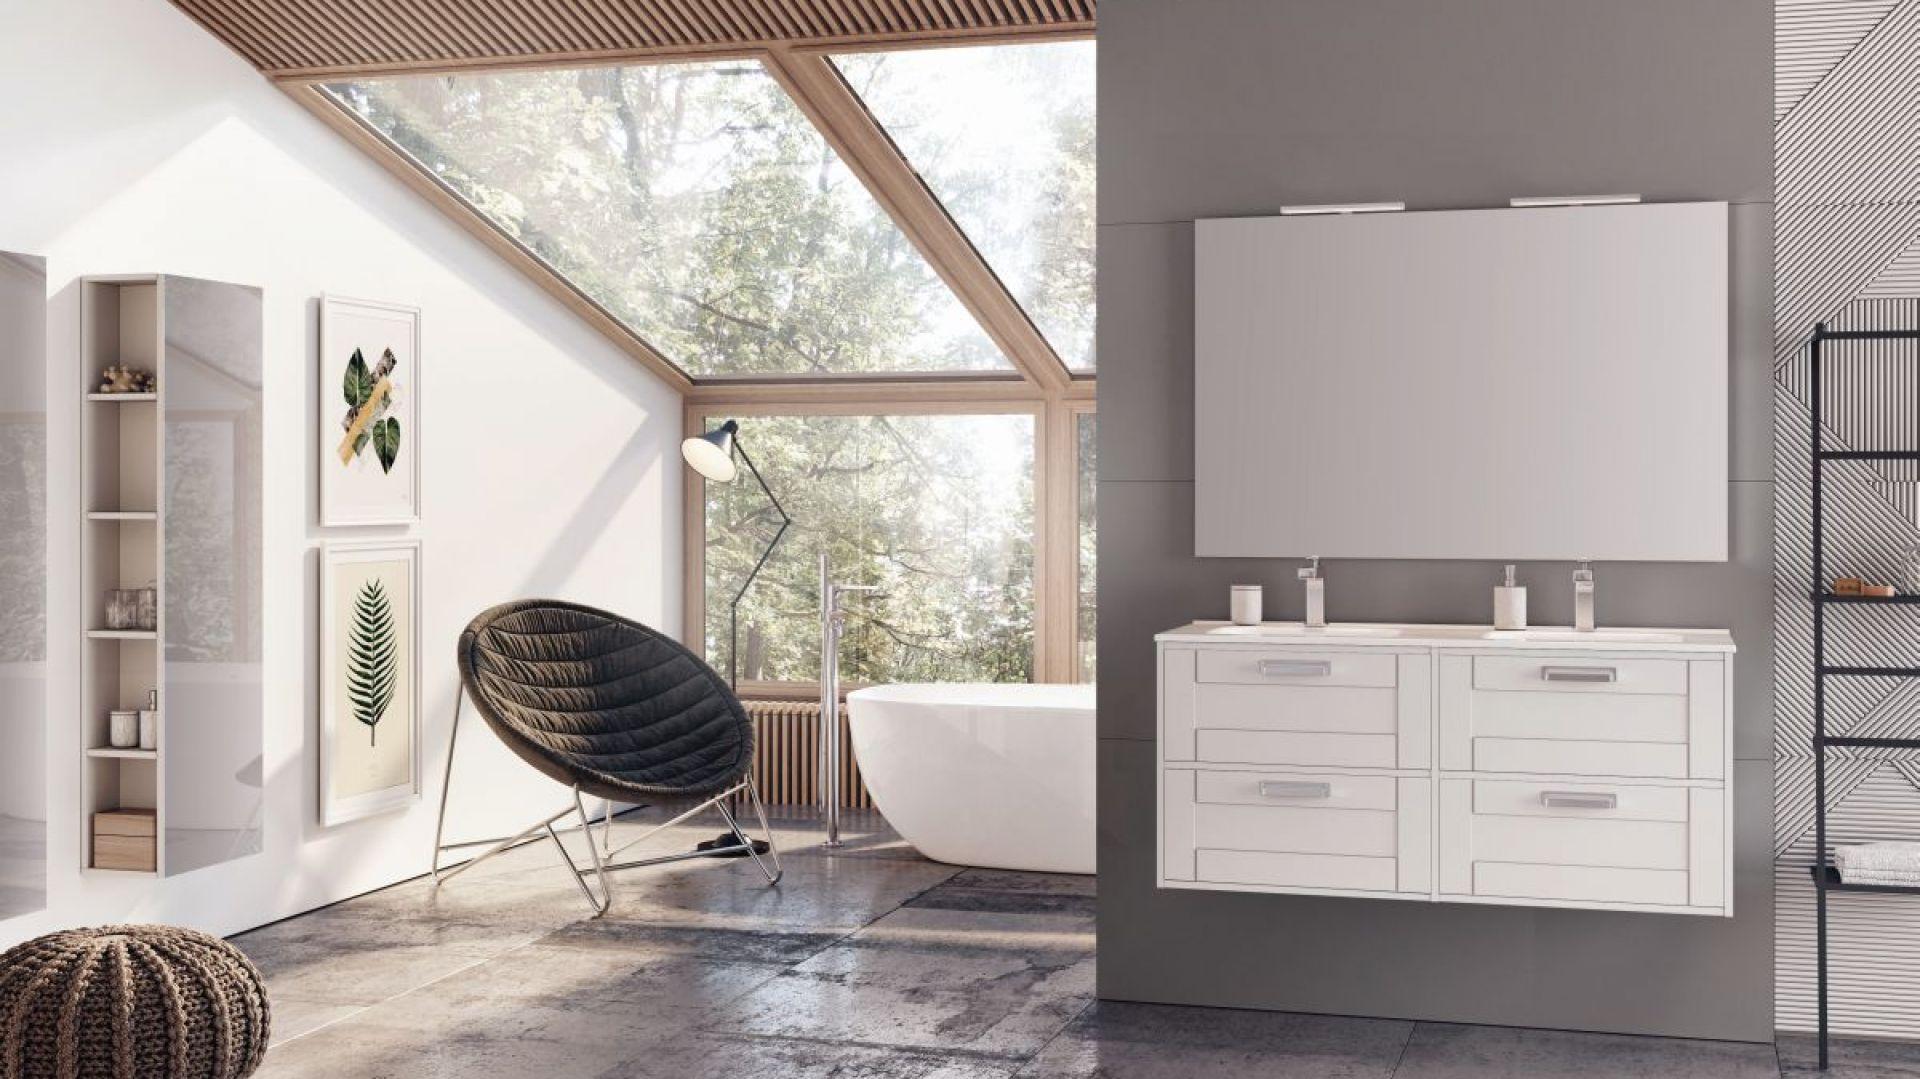 Białe meble łazienkowe z kolekcji Inge. Fot. Elita